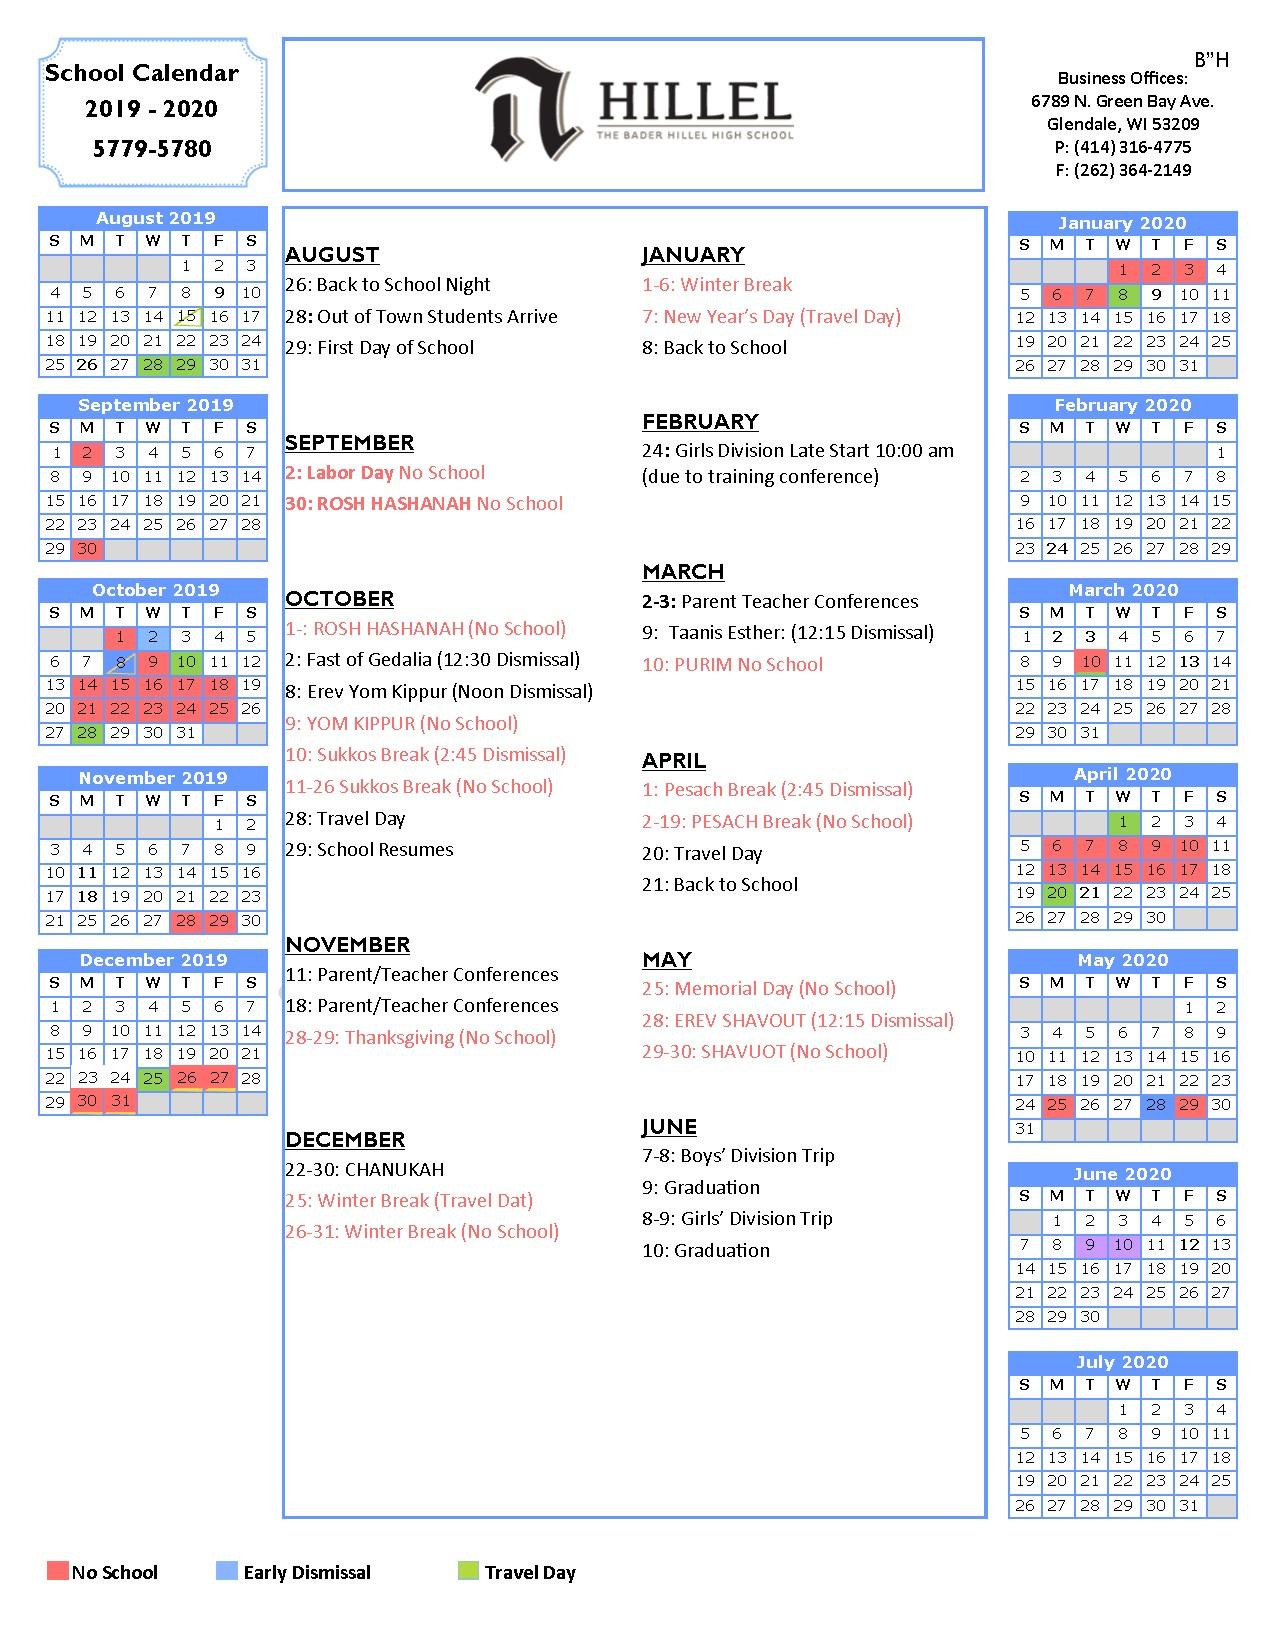 School District 93 Calendar For 2020  2021 | Printable Inside Smithtown School Calendar 2021 20